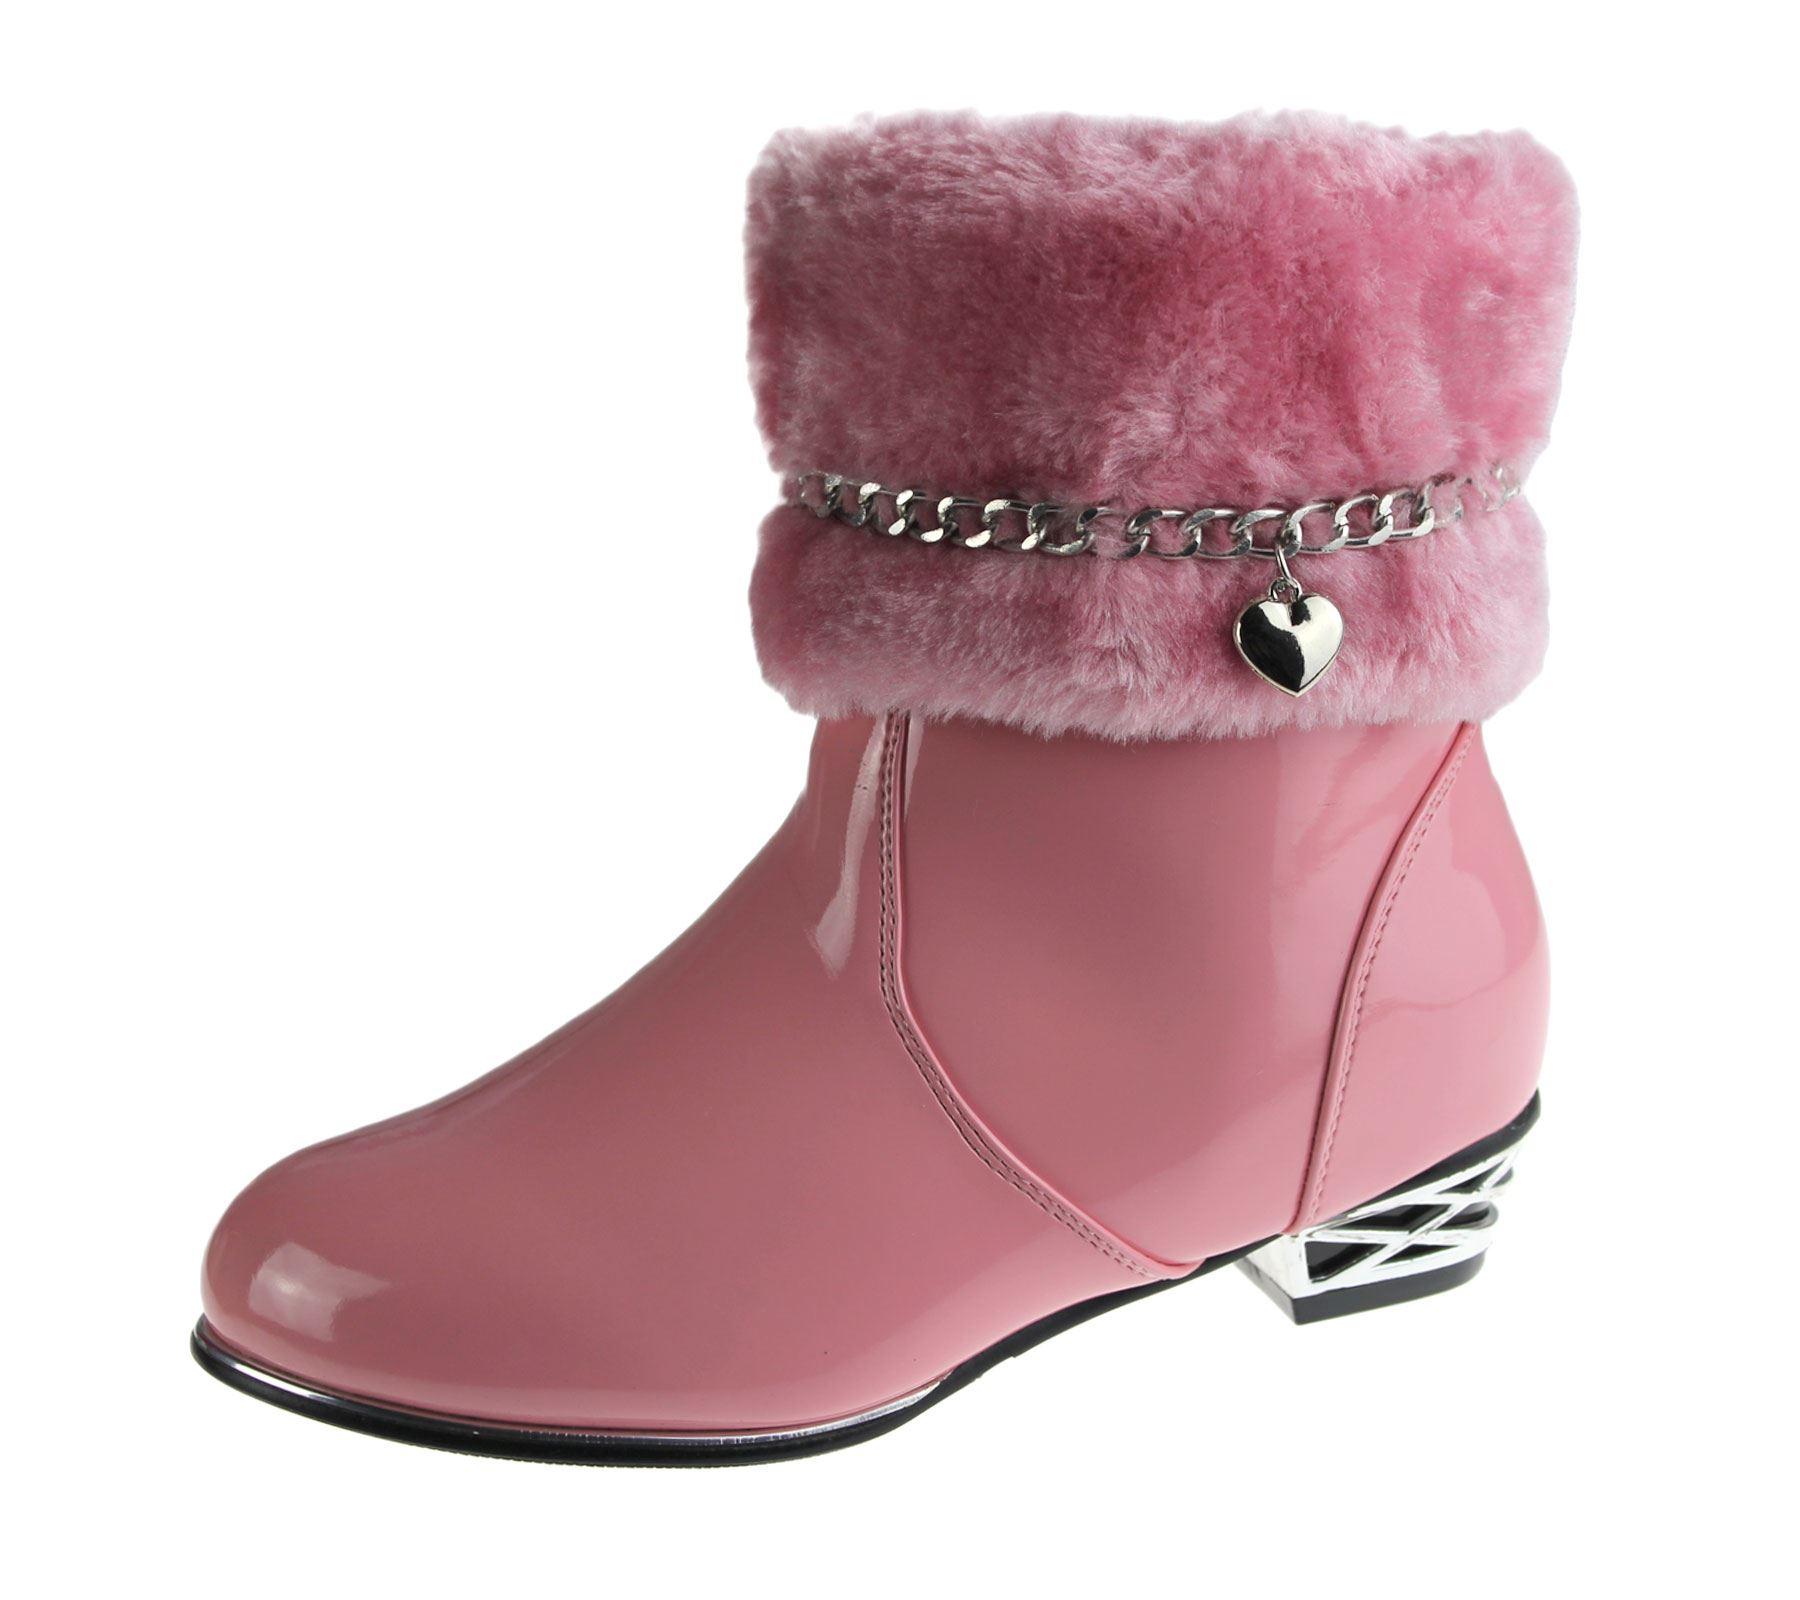 Girls Fur Lined Boots Kids Winter Warm Fancy Party High